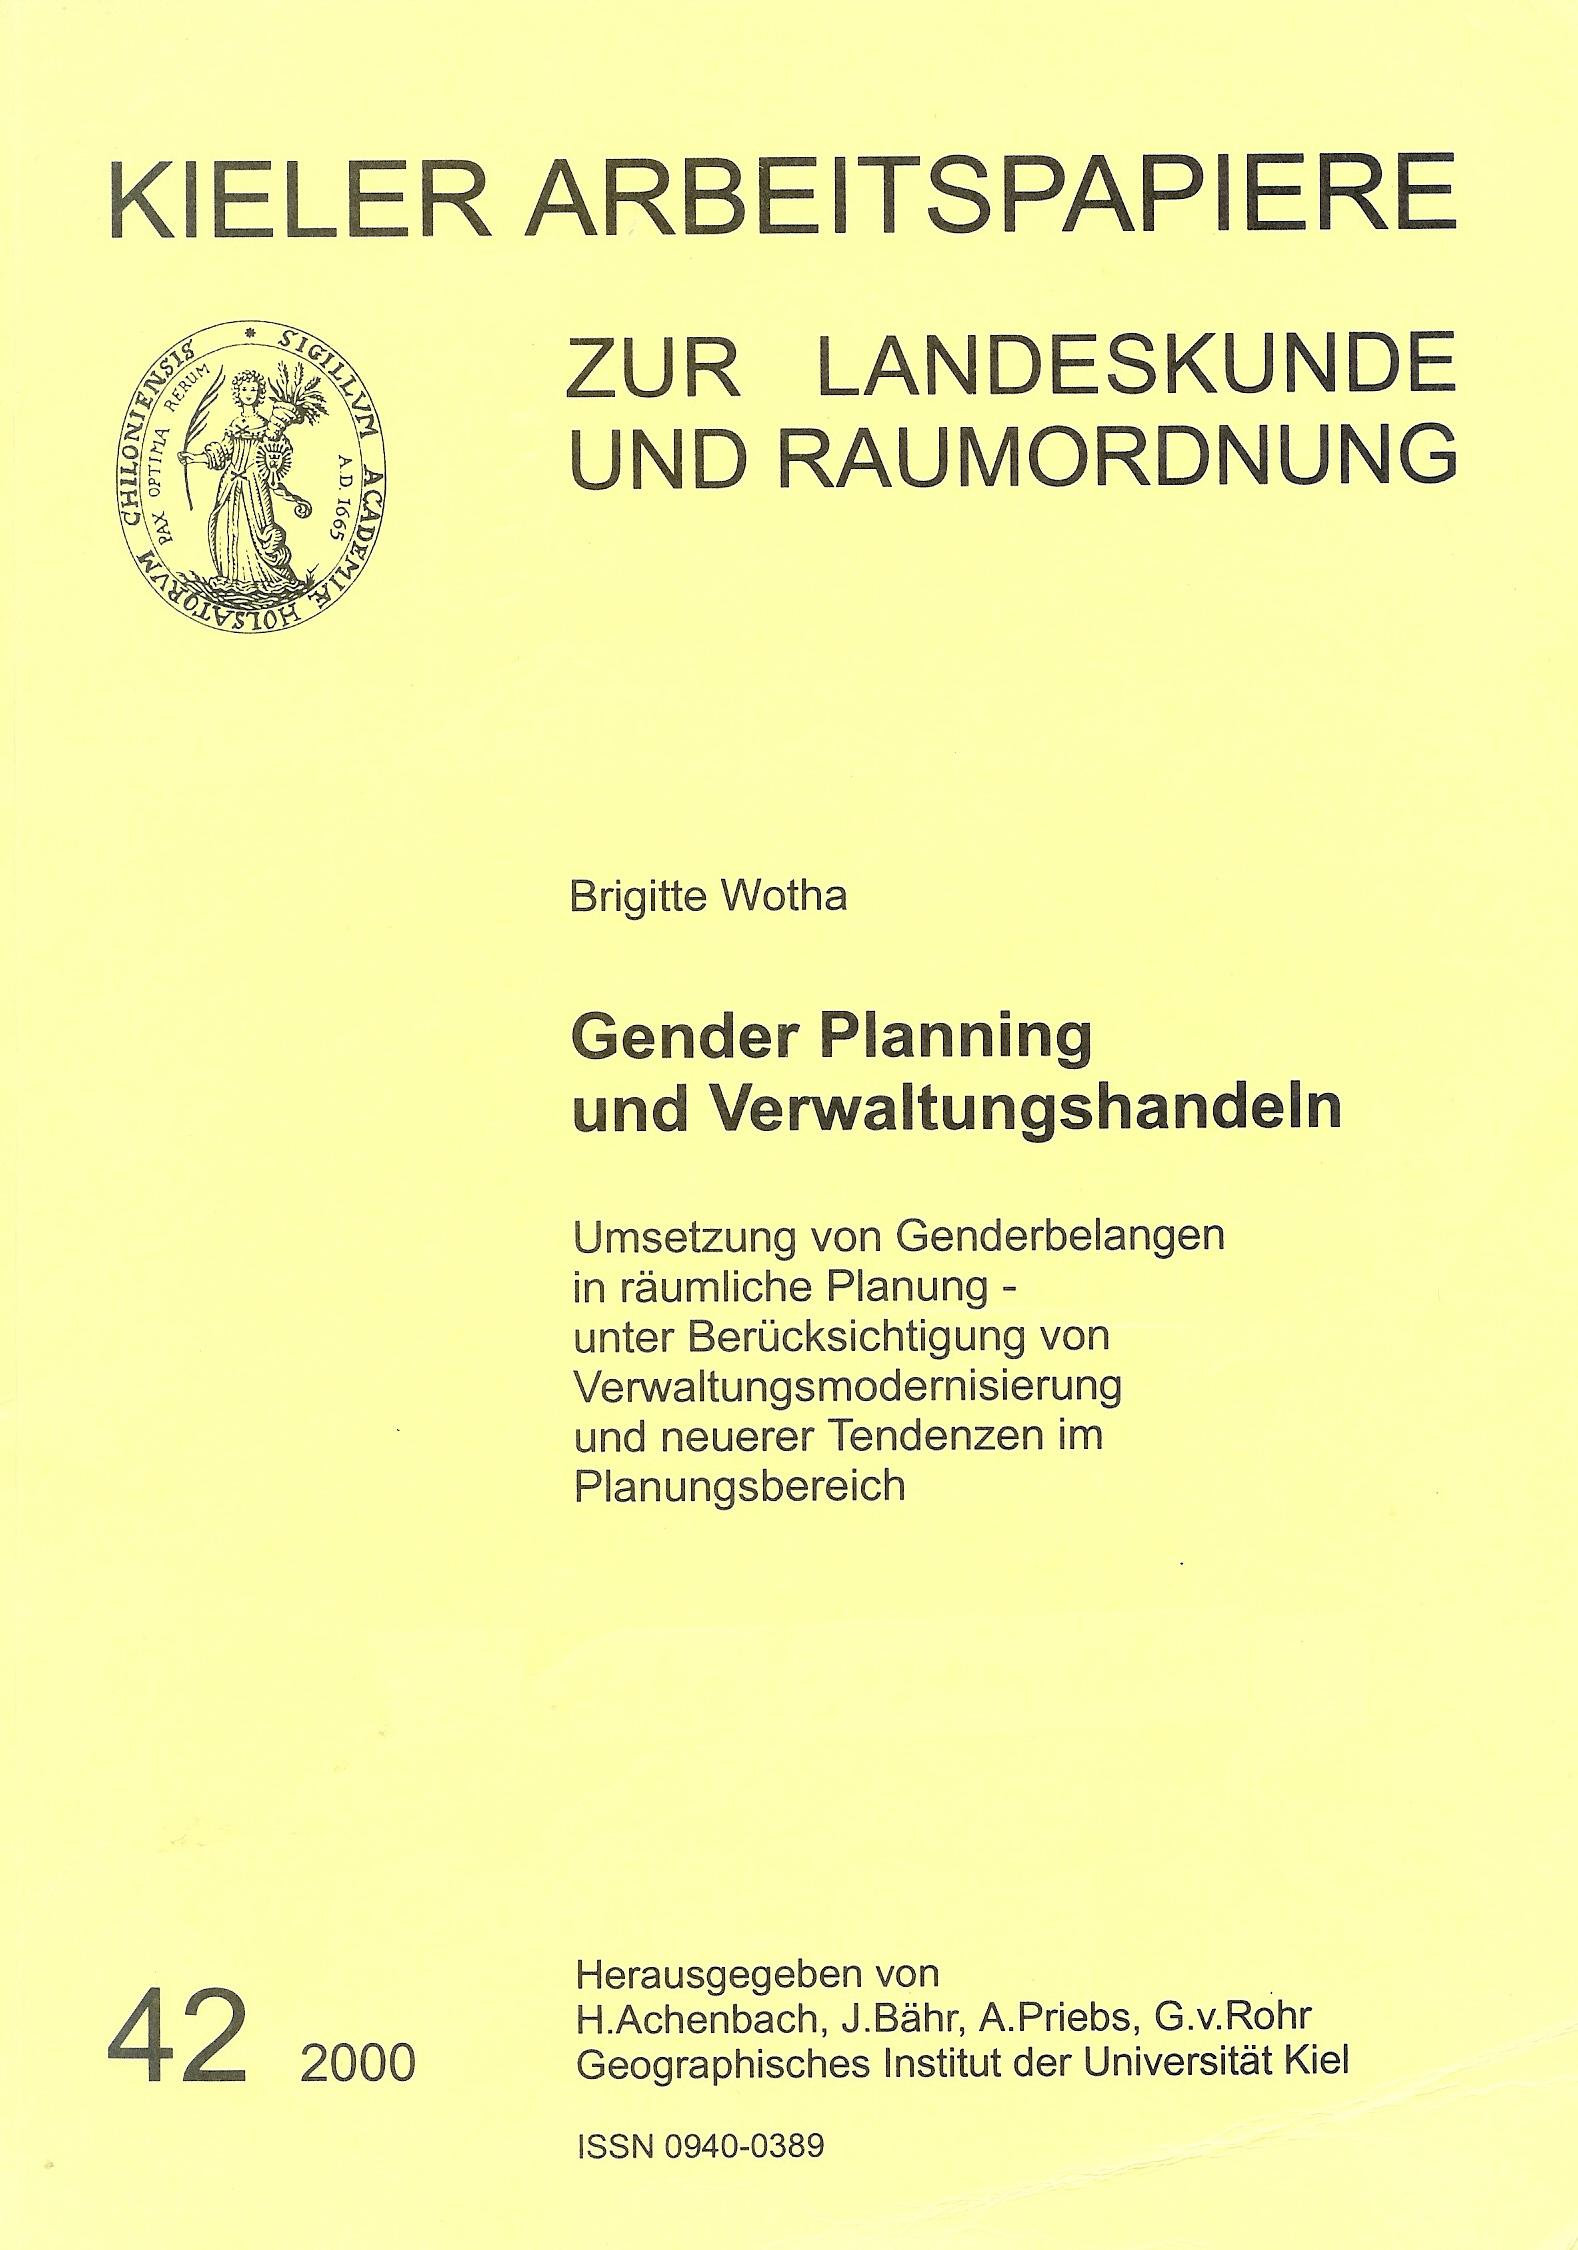 Gender Mainstreaming in adminstration  handbook by Brigitte Wotha